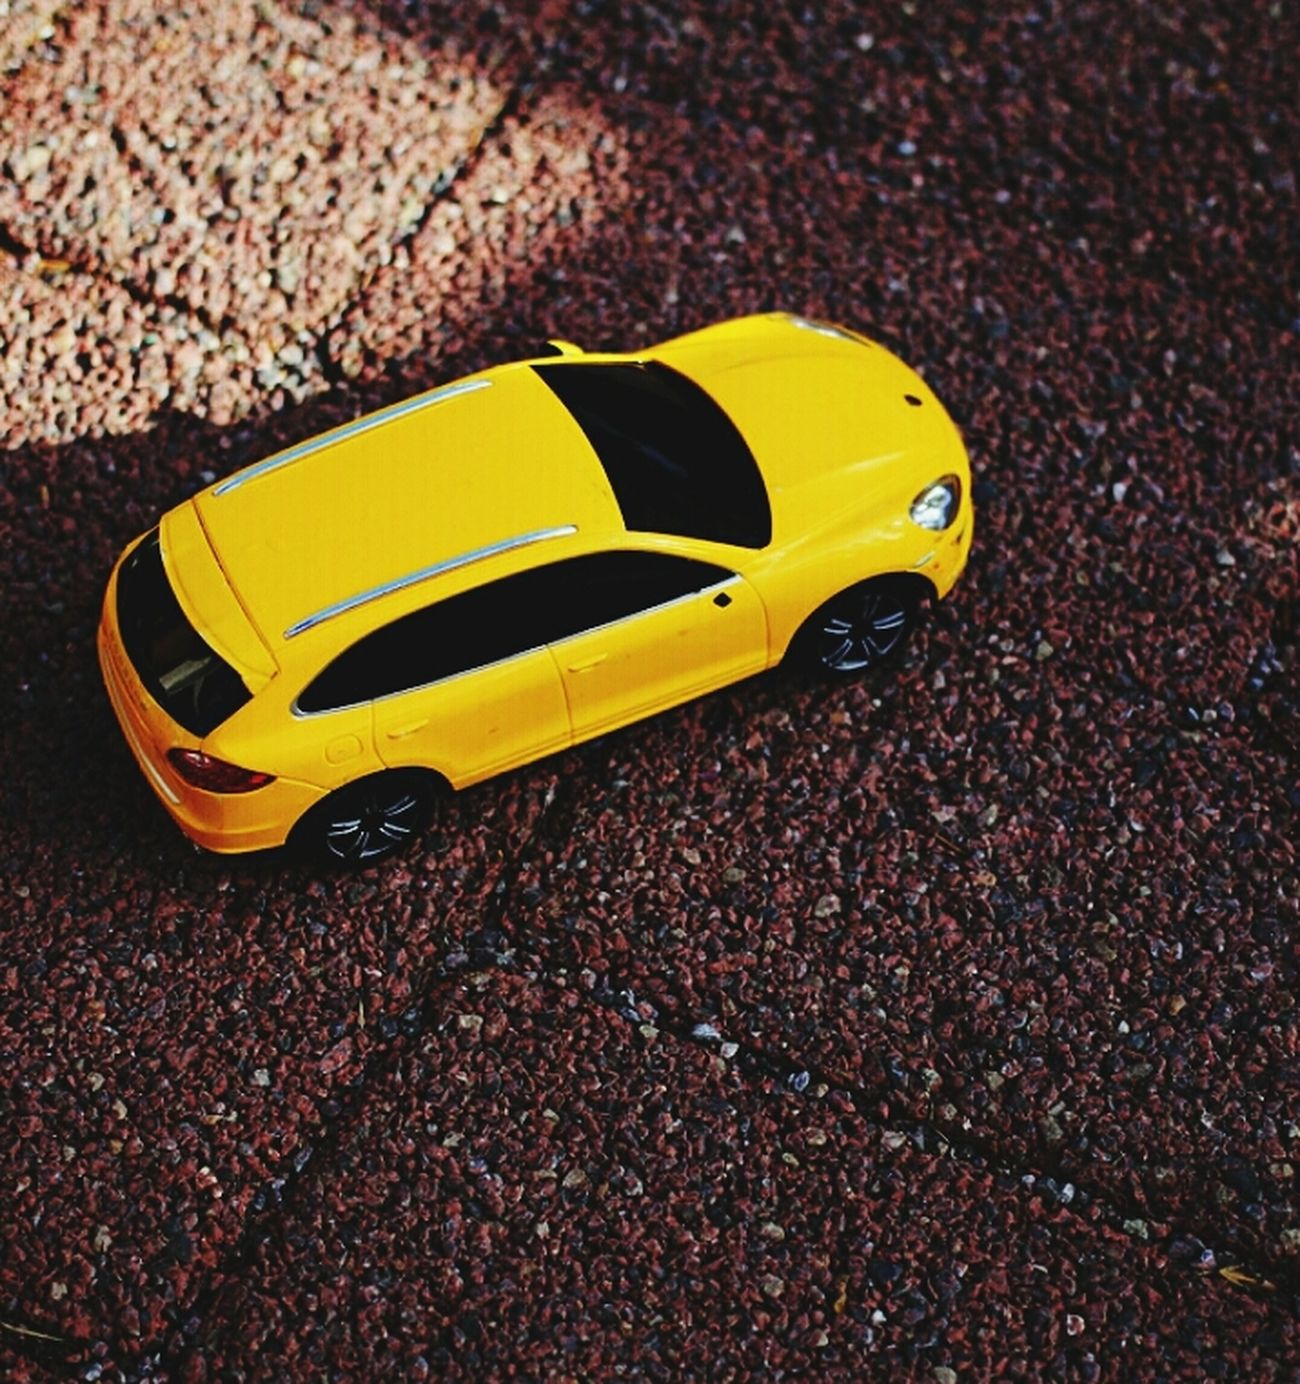 Porche Cayenne Wireless Toy LAst Autumn @korea seoul nung-dong @Canon eos 100d / 17-50mm f2.8